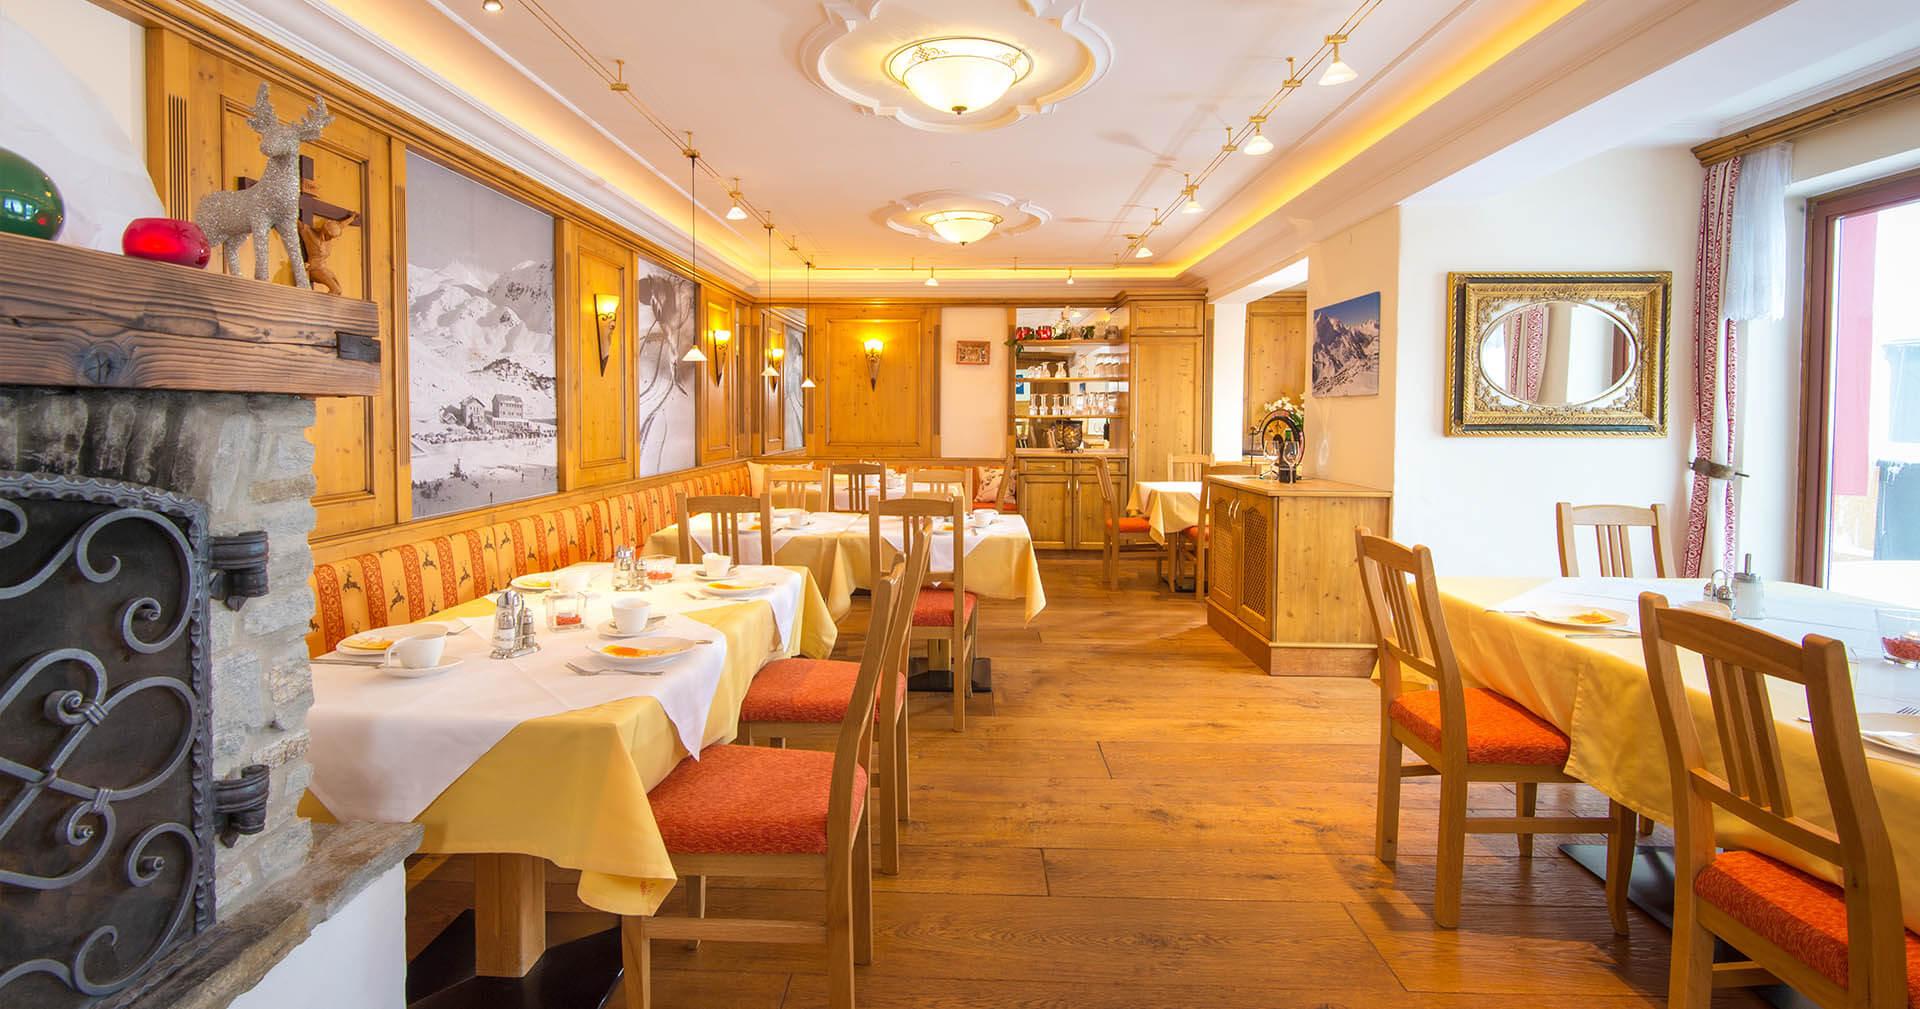 Hotel neben der Piste in Obertauern - Kulinarik - Hotel Binggl